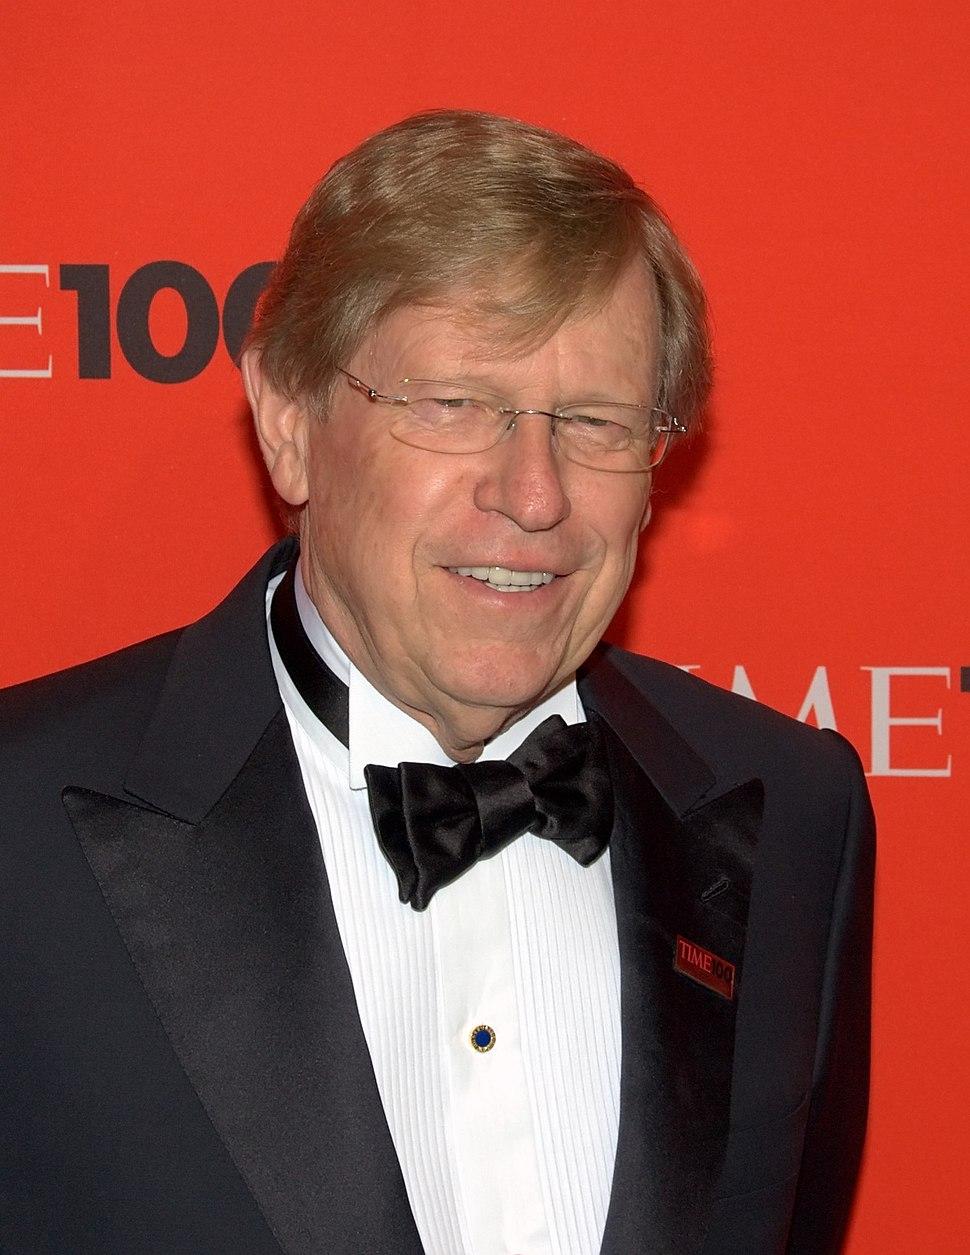 Theodore Olson - 2010 - David Shankbone